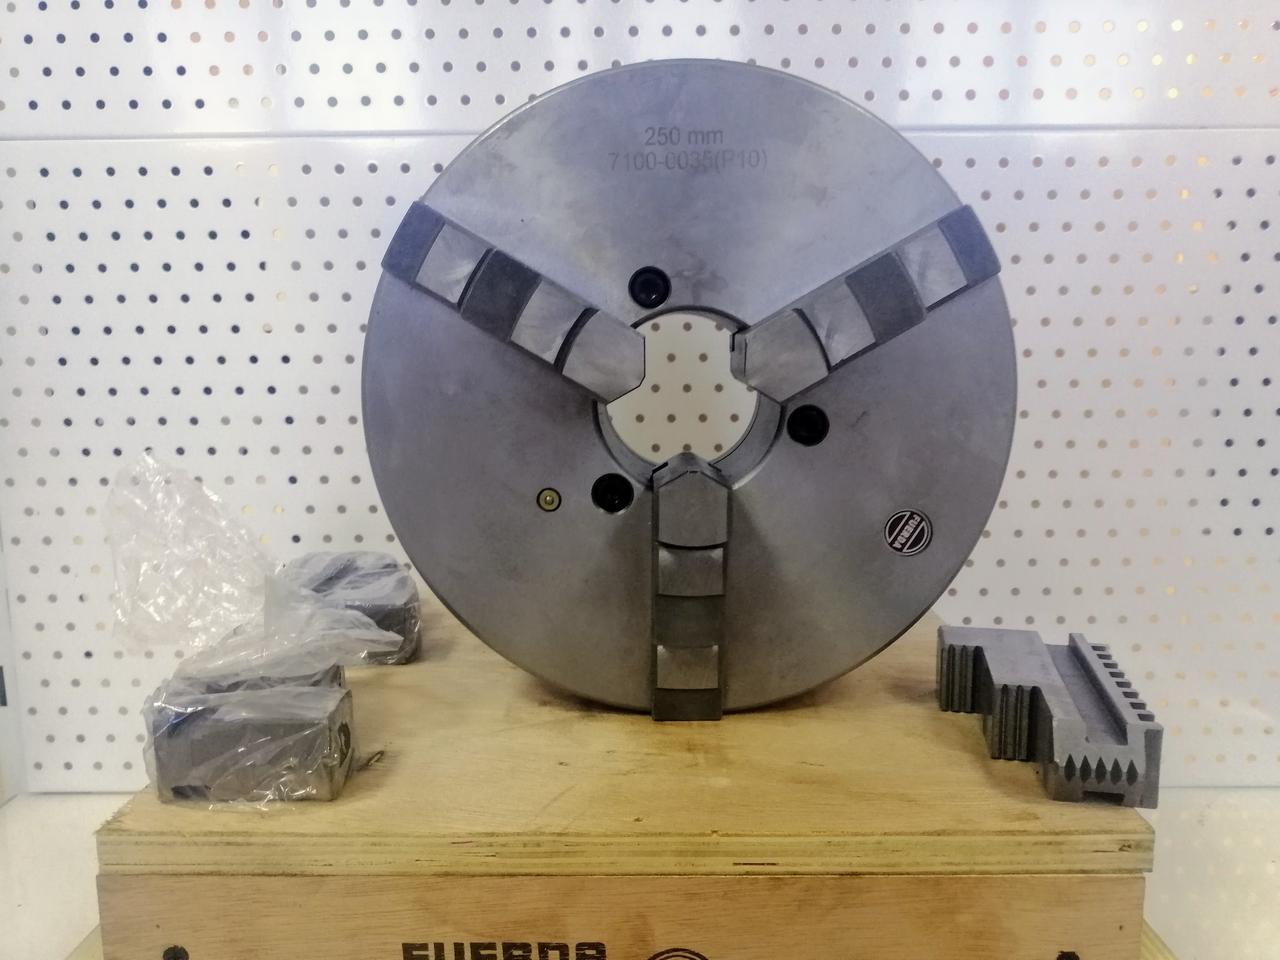 Патрон токарный 3-х кулачковый Ф 250 мм. 7100-0035П на конус, шаг 10мм. М6 Fuerda